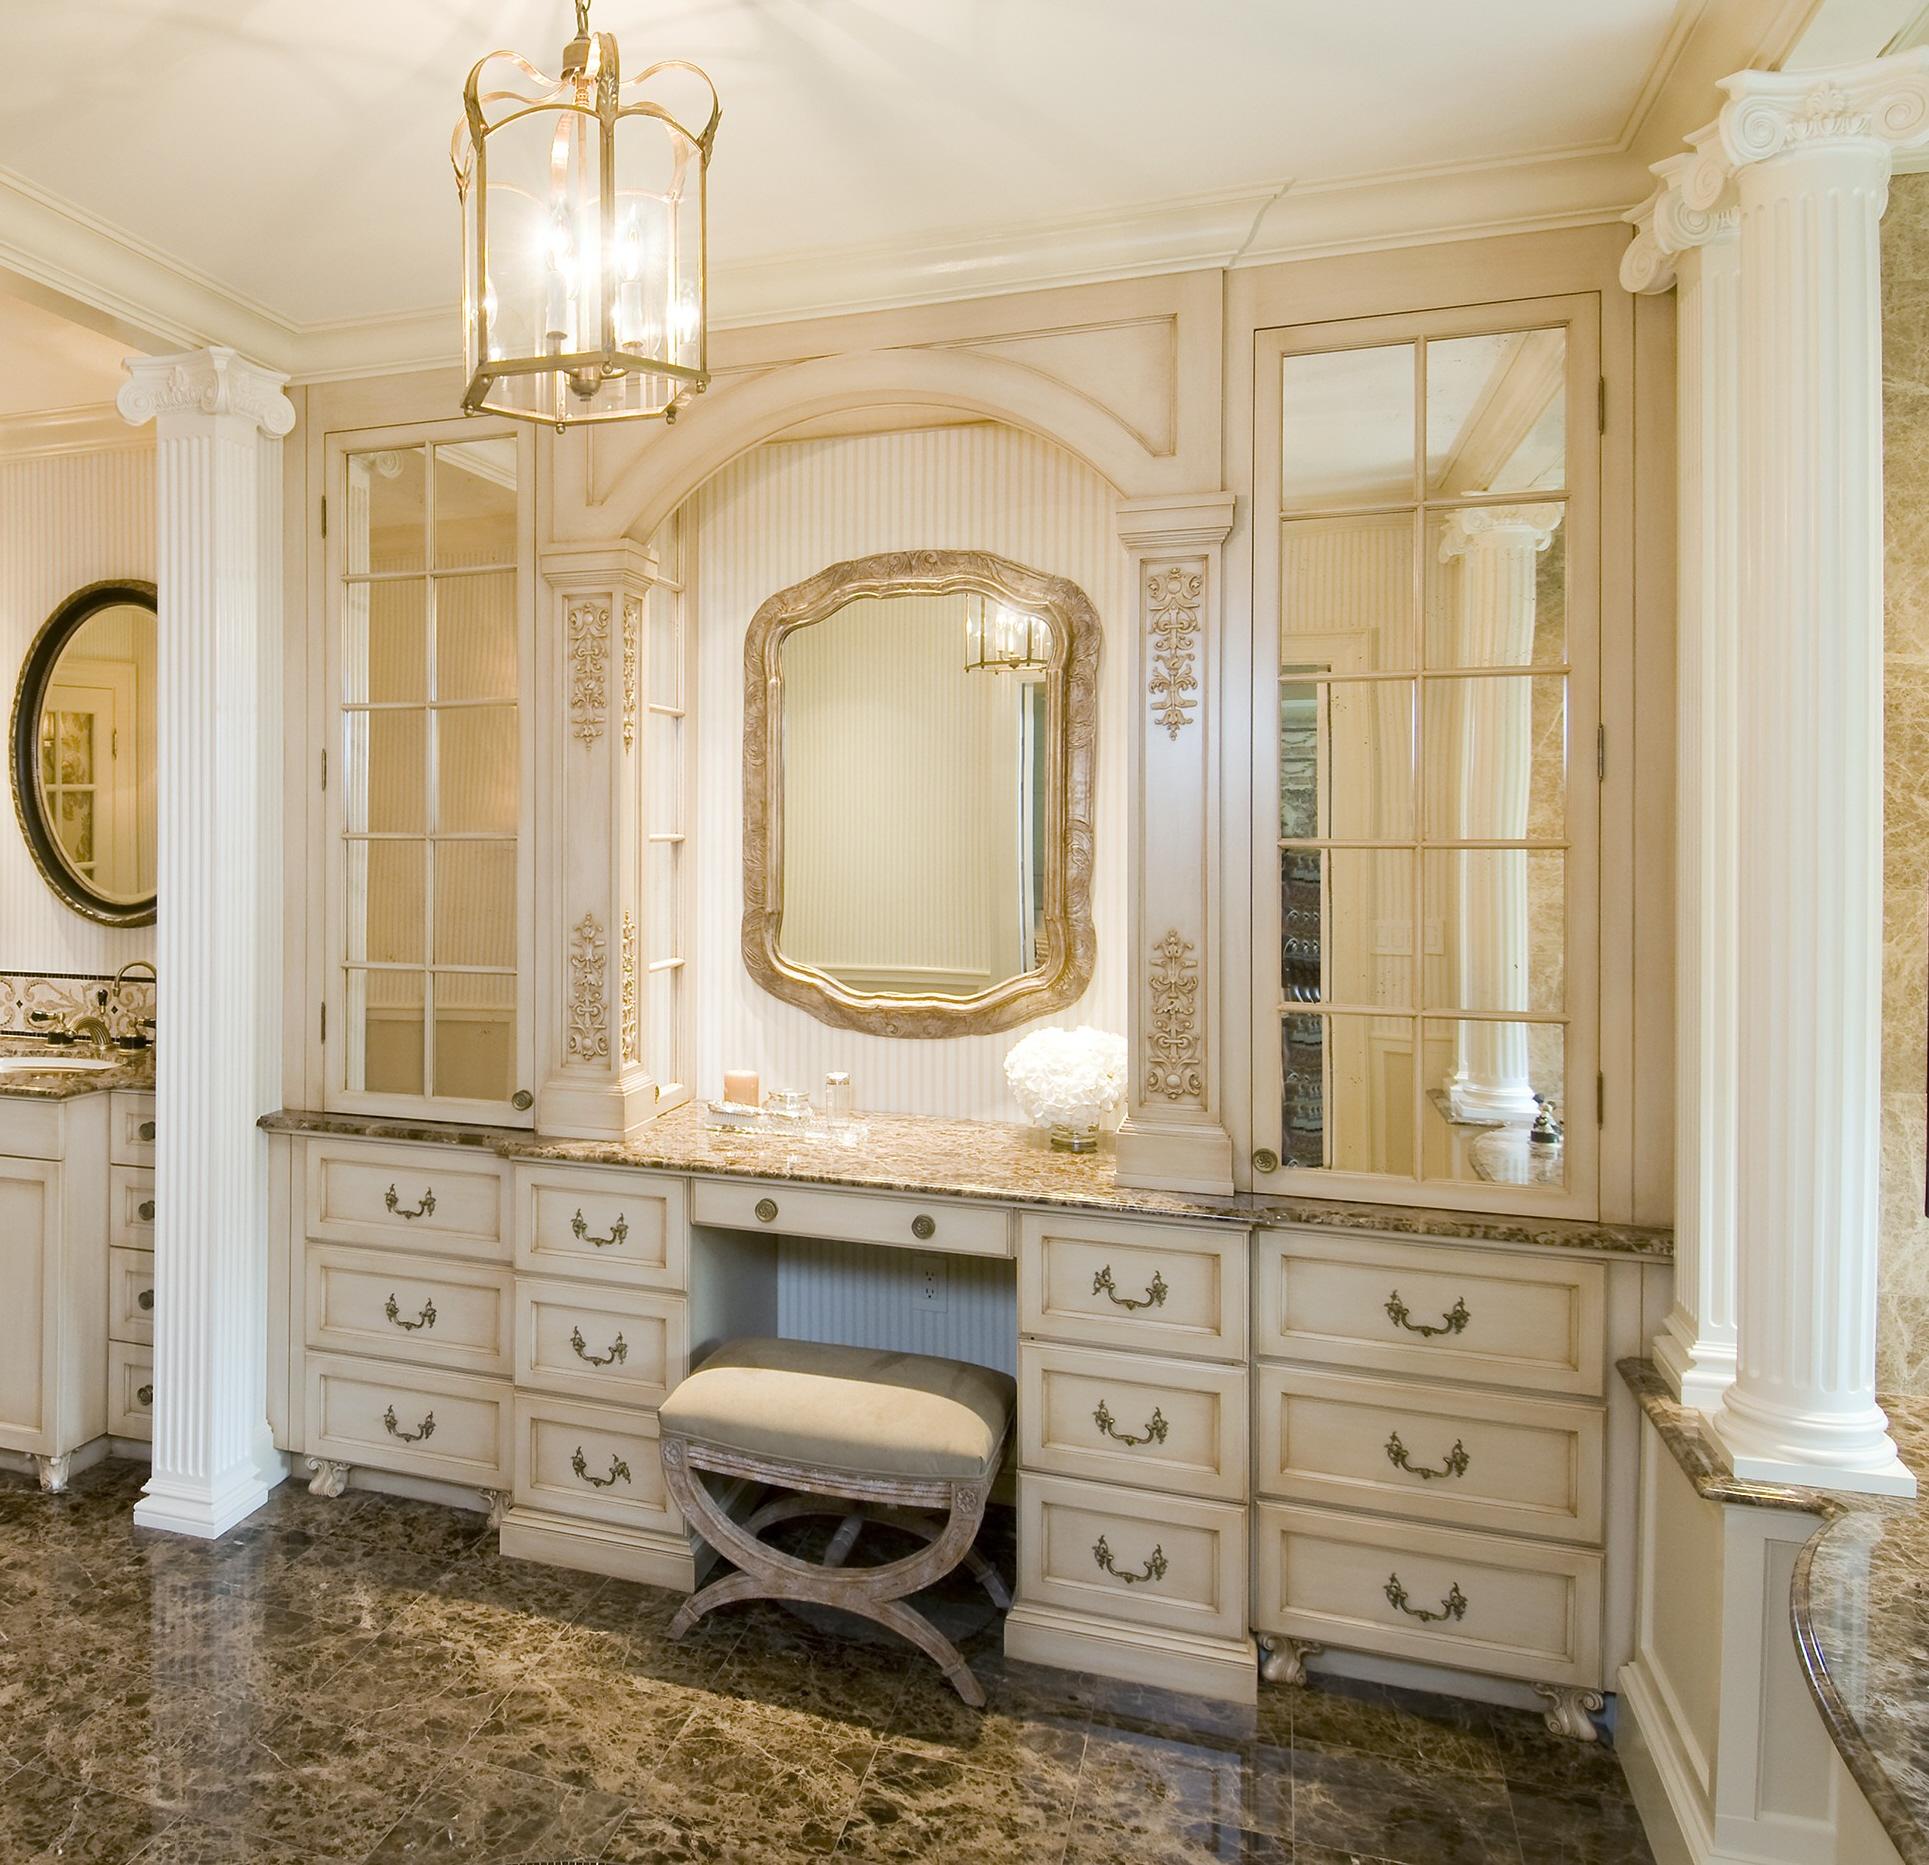 Boston Interior Design Firm Wilson Kelsey Designs Award Winning